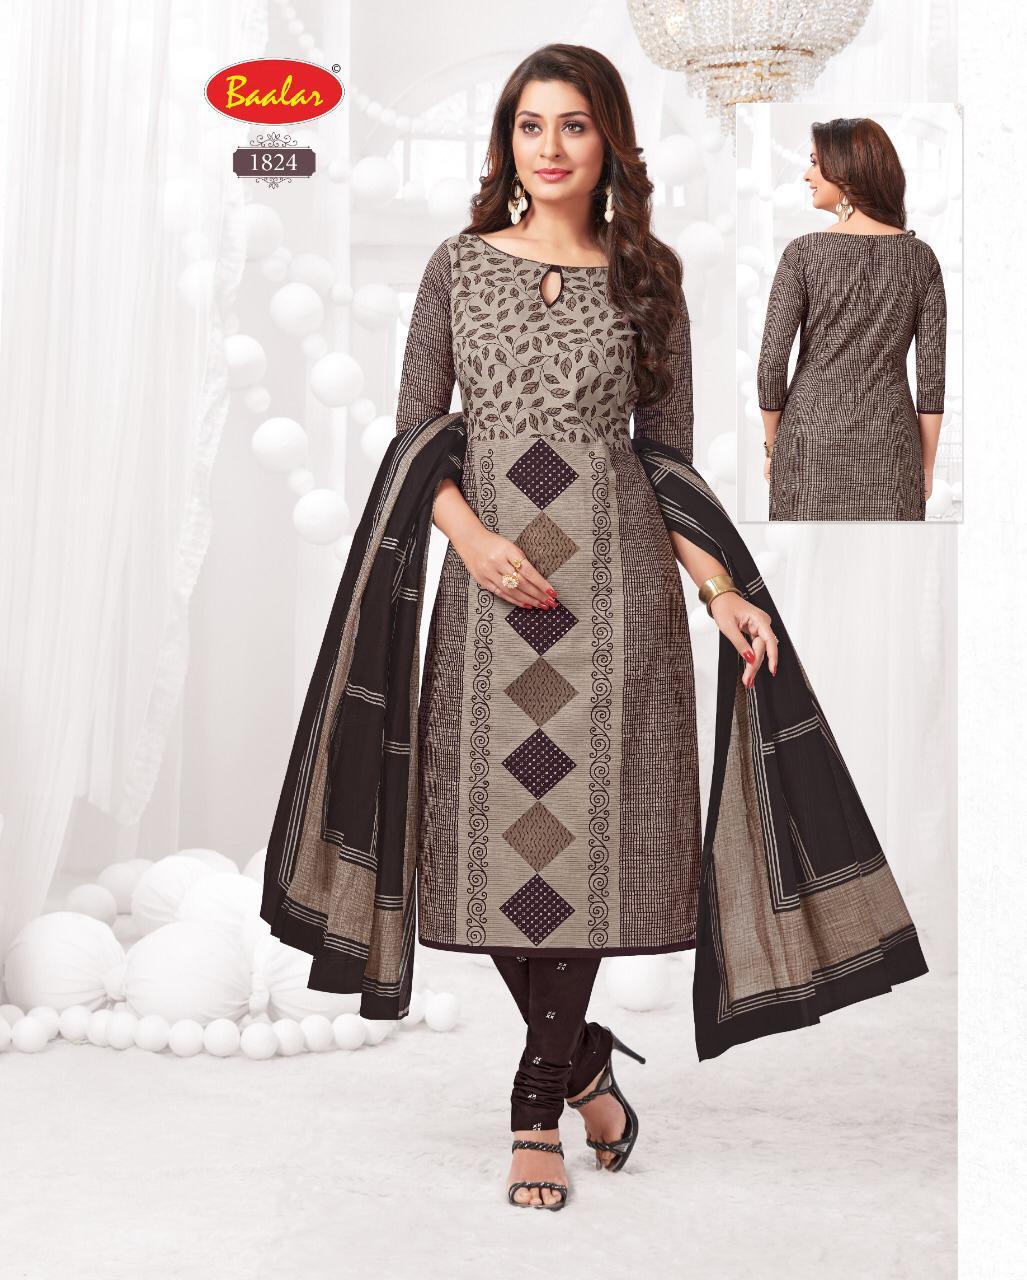 Balaar  1800 Series Cotton  Suits Collections Wholesale Box